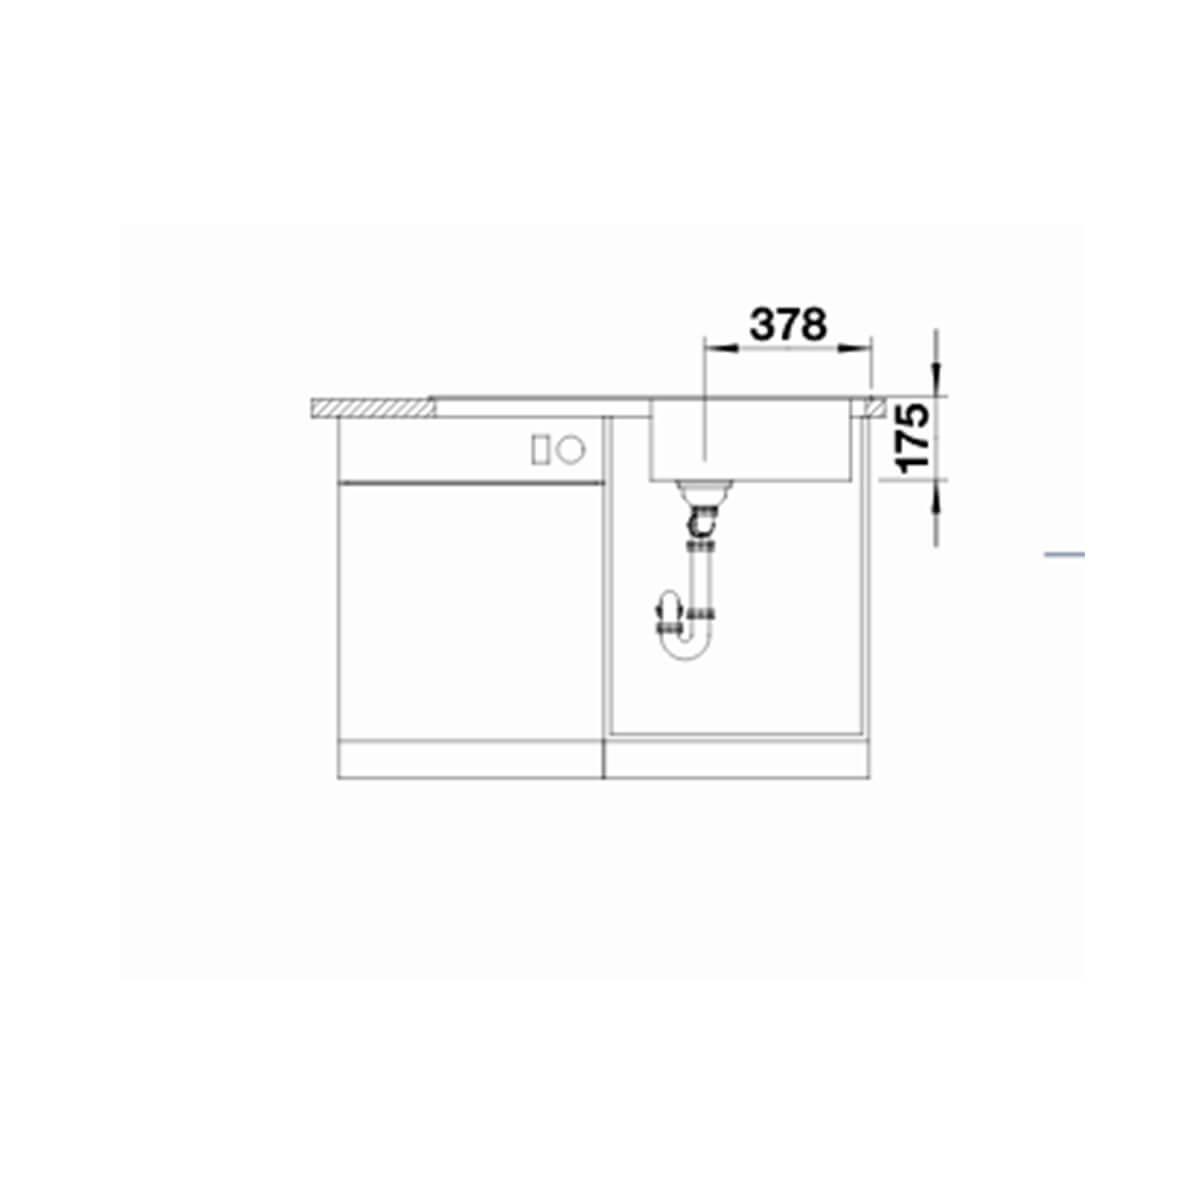 BLANCO ΑΝΟΞΕΙΔΩΤΟΣ ΝΕΡΟΧΥΤΗΣ ΕΝΘΕΤΟΣ MEDIAN XL 6 S-IF ΛΕΙΟΣ ΓΟΥΡΝΑ ΔΕΞΙΑ (100x50) 5